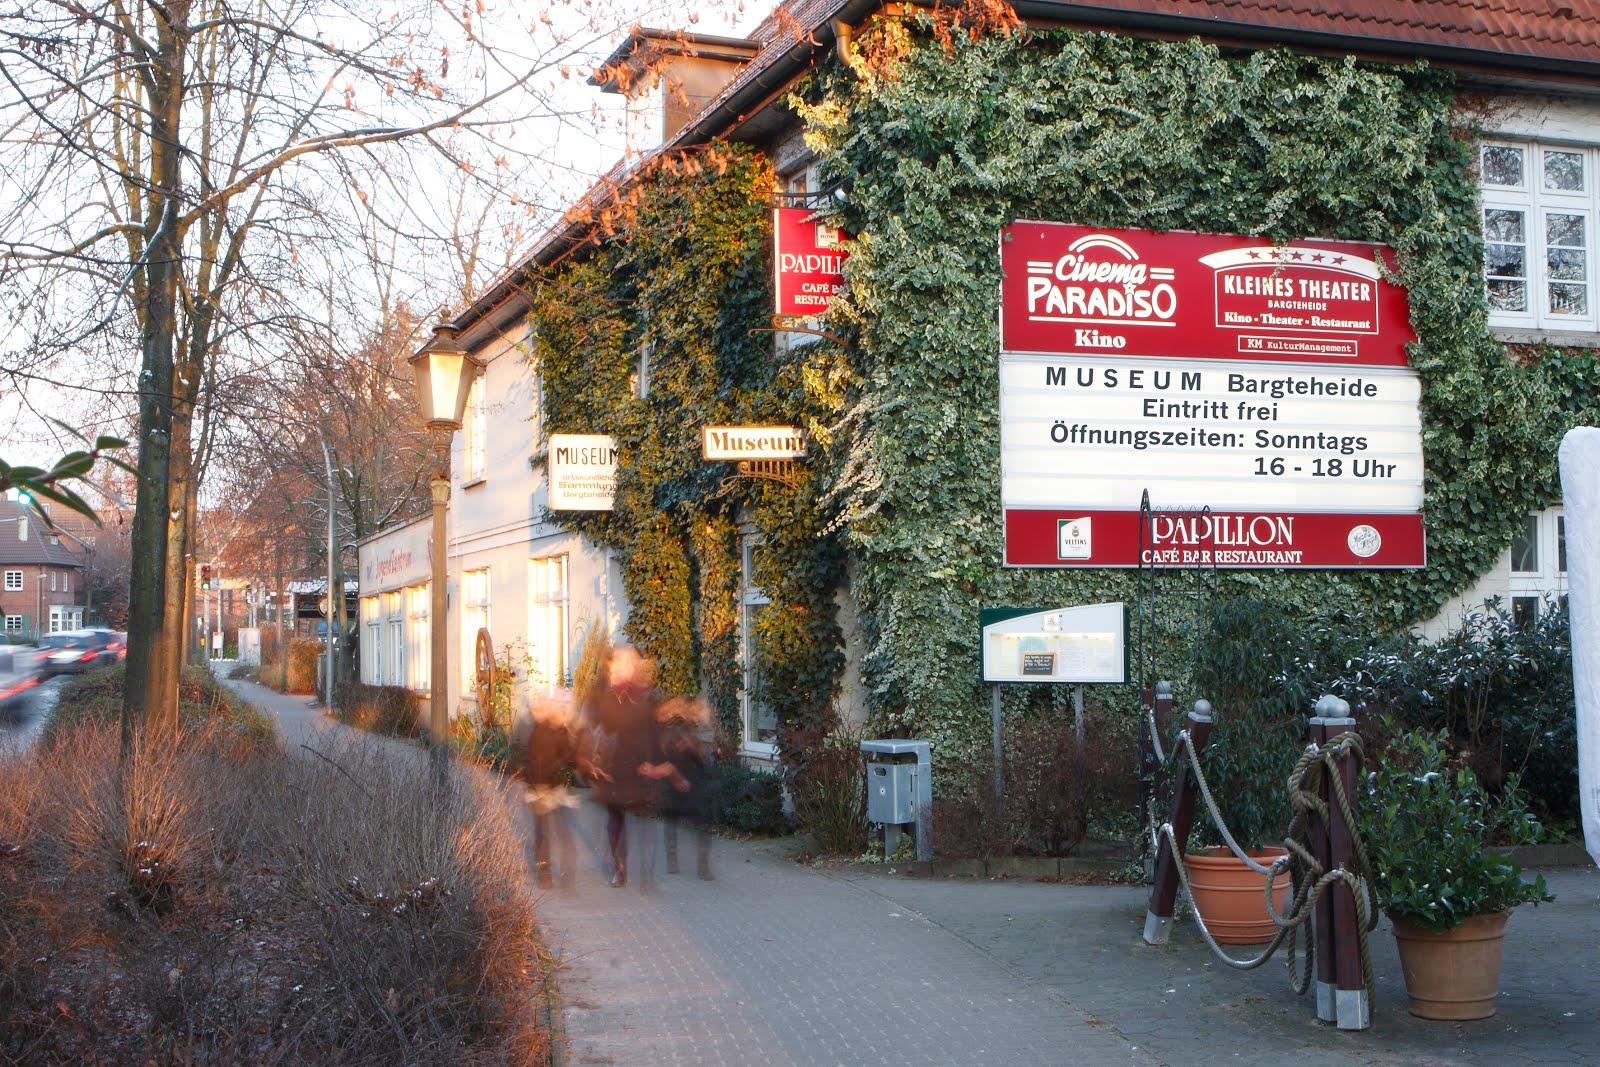 Heimatmuseum Bargteheide